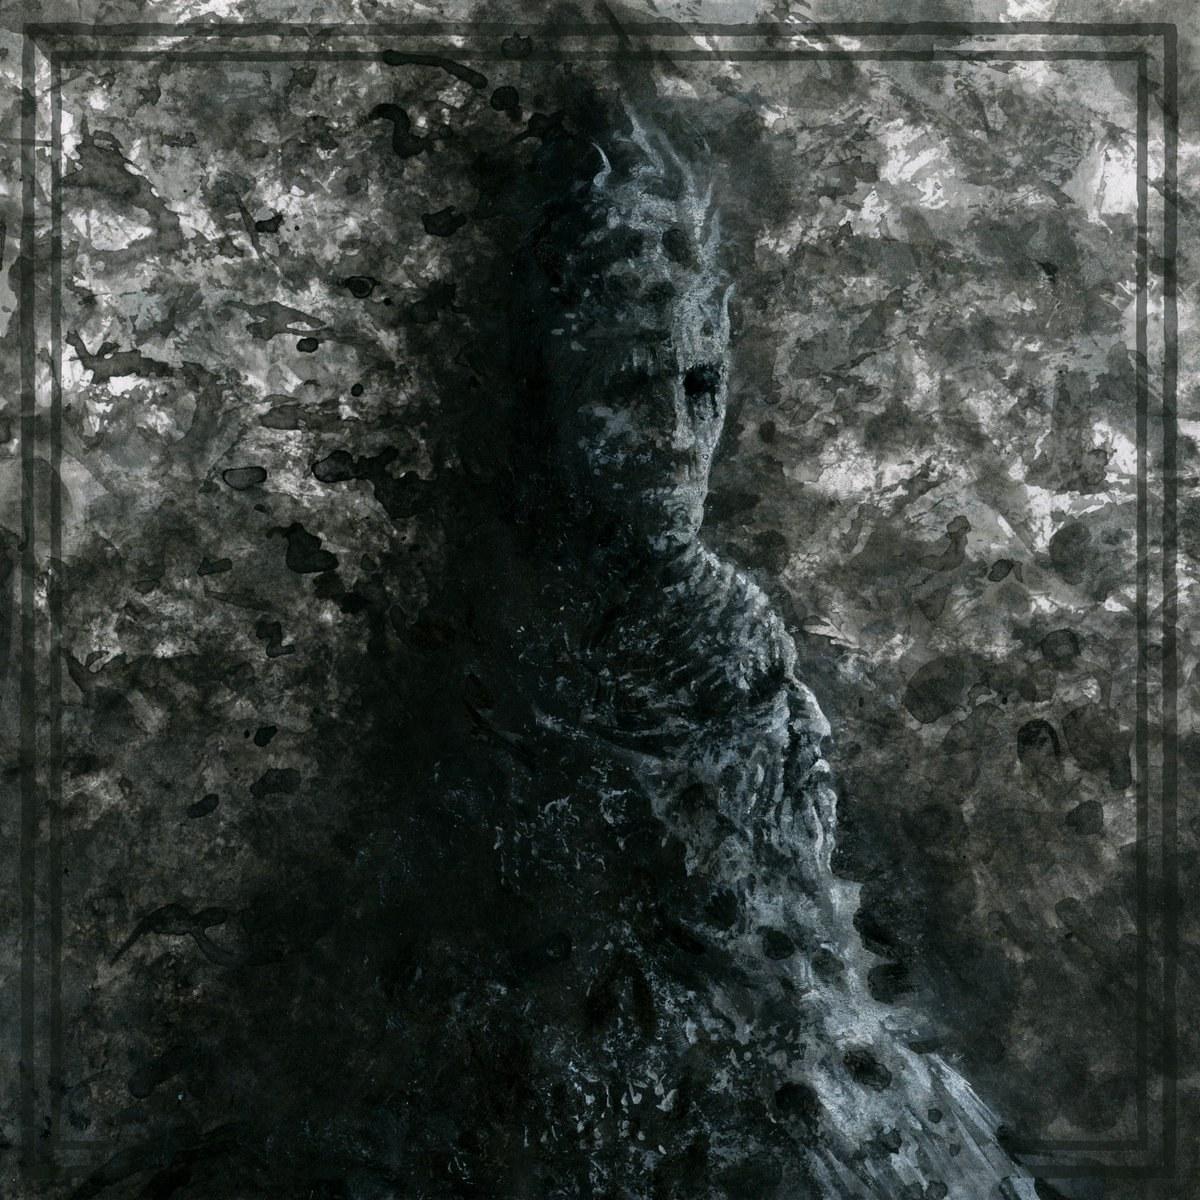 Wiedergänger - Cult of Extinction